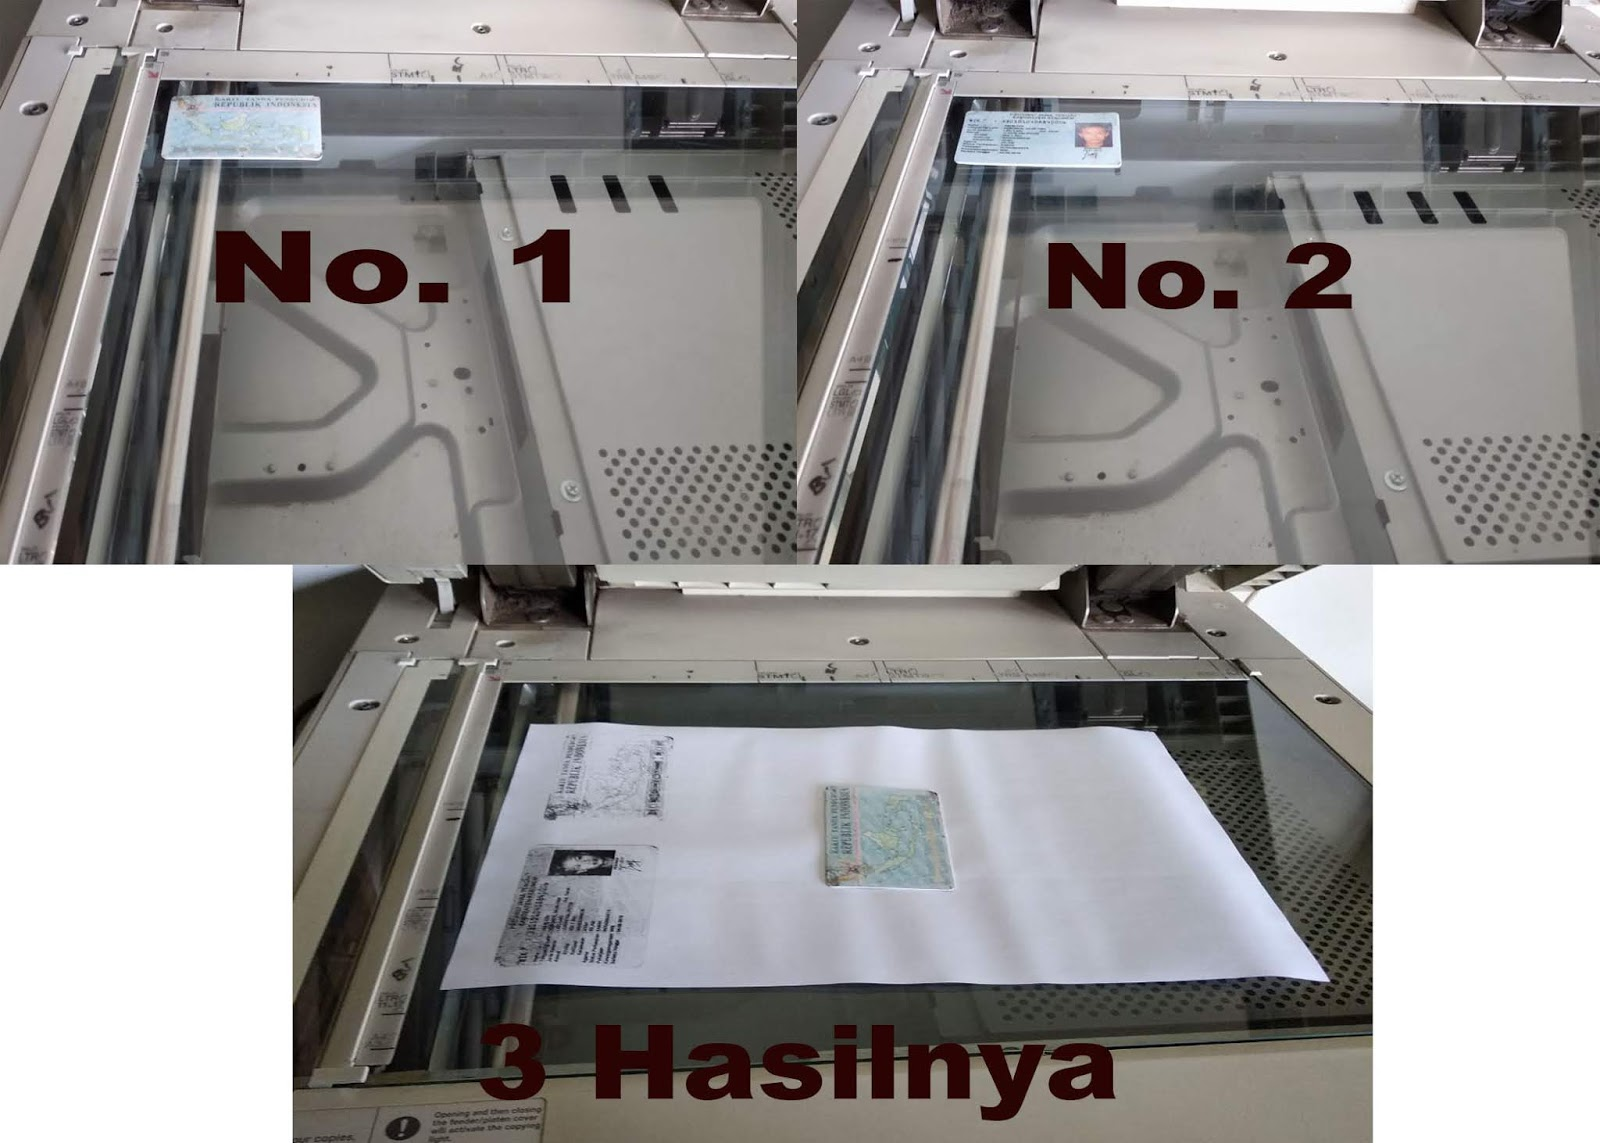 cara fotocopy ktp dan stnk bolak balik